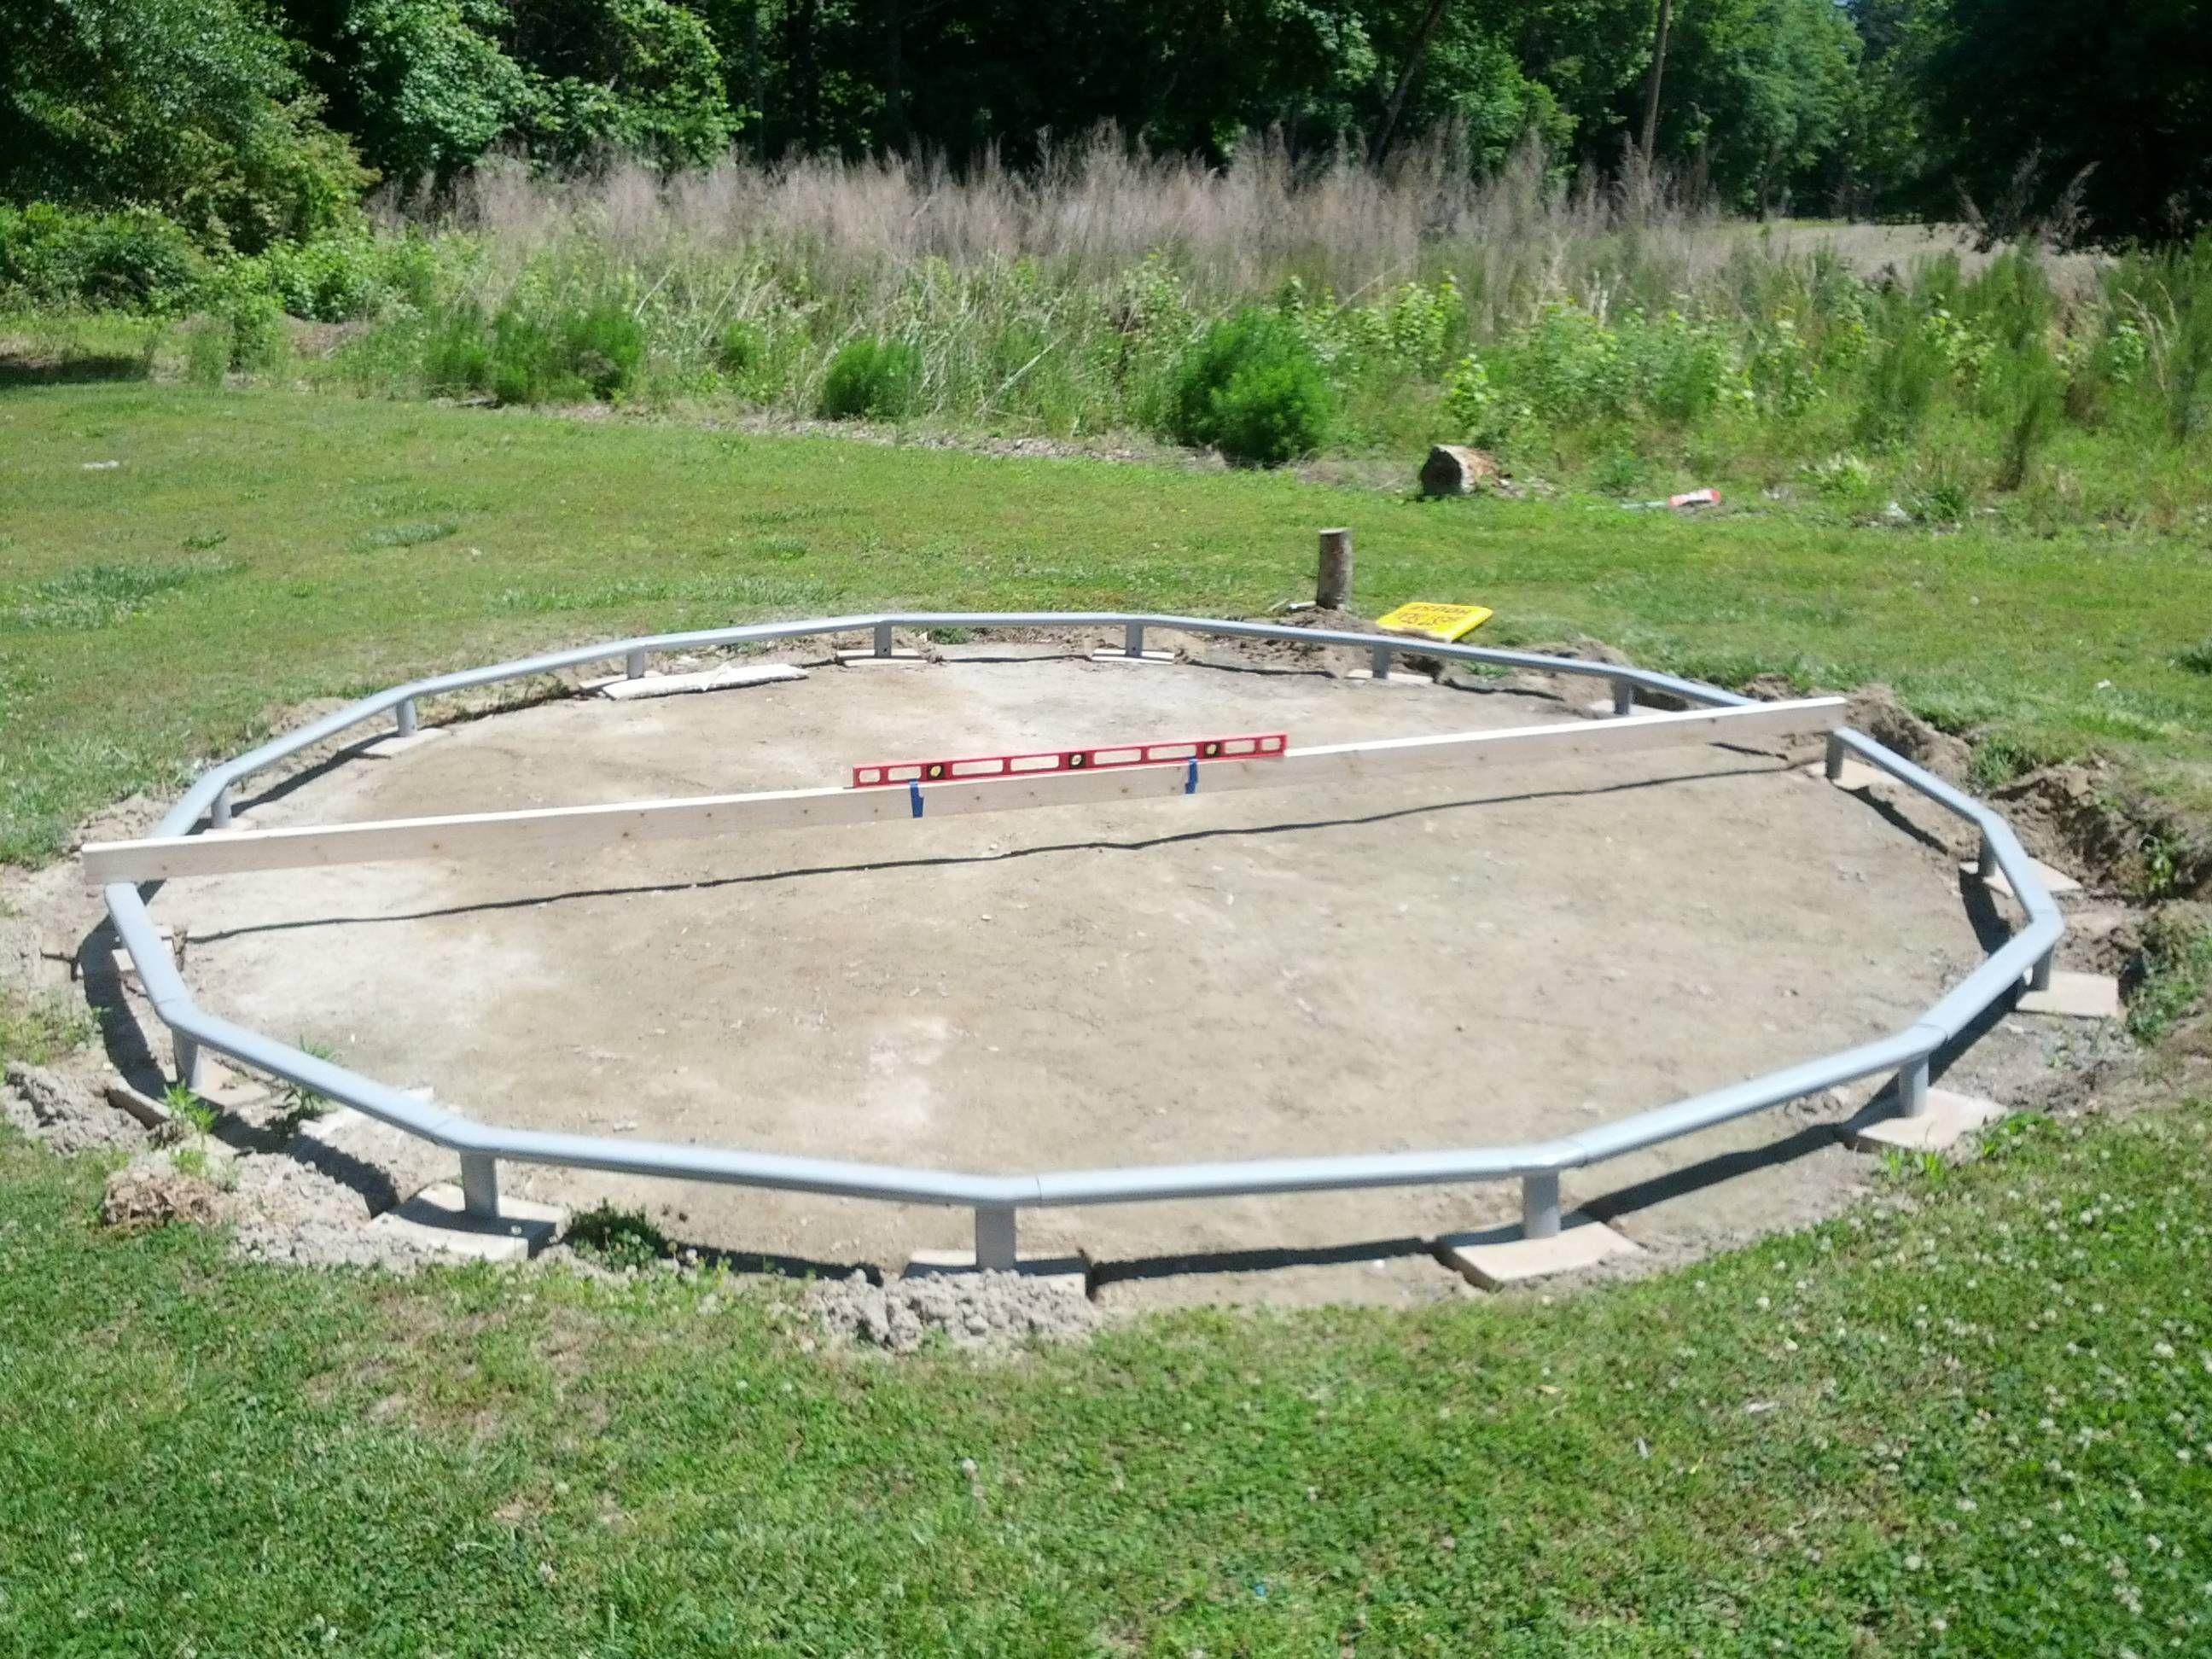 I need advice on leveling my ground trouble free pool